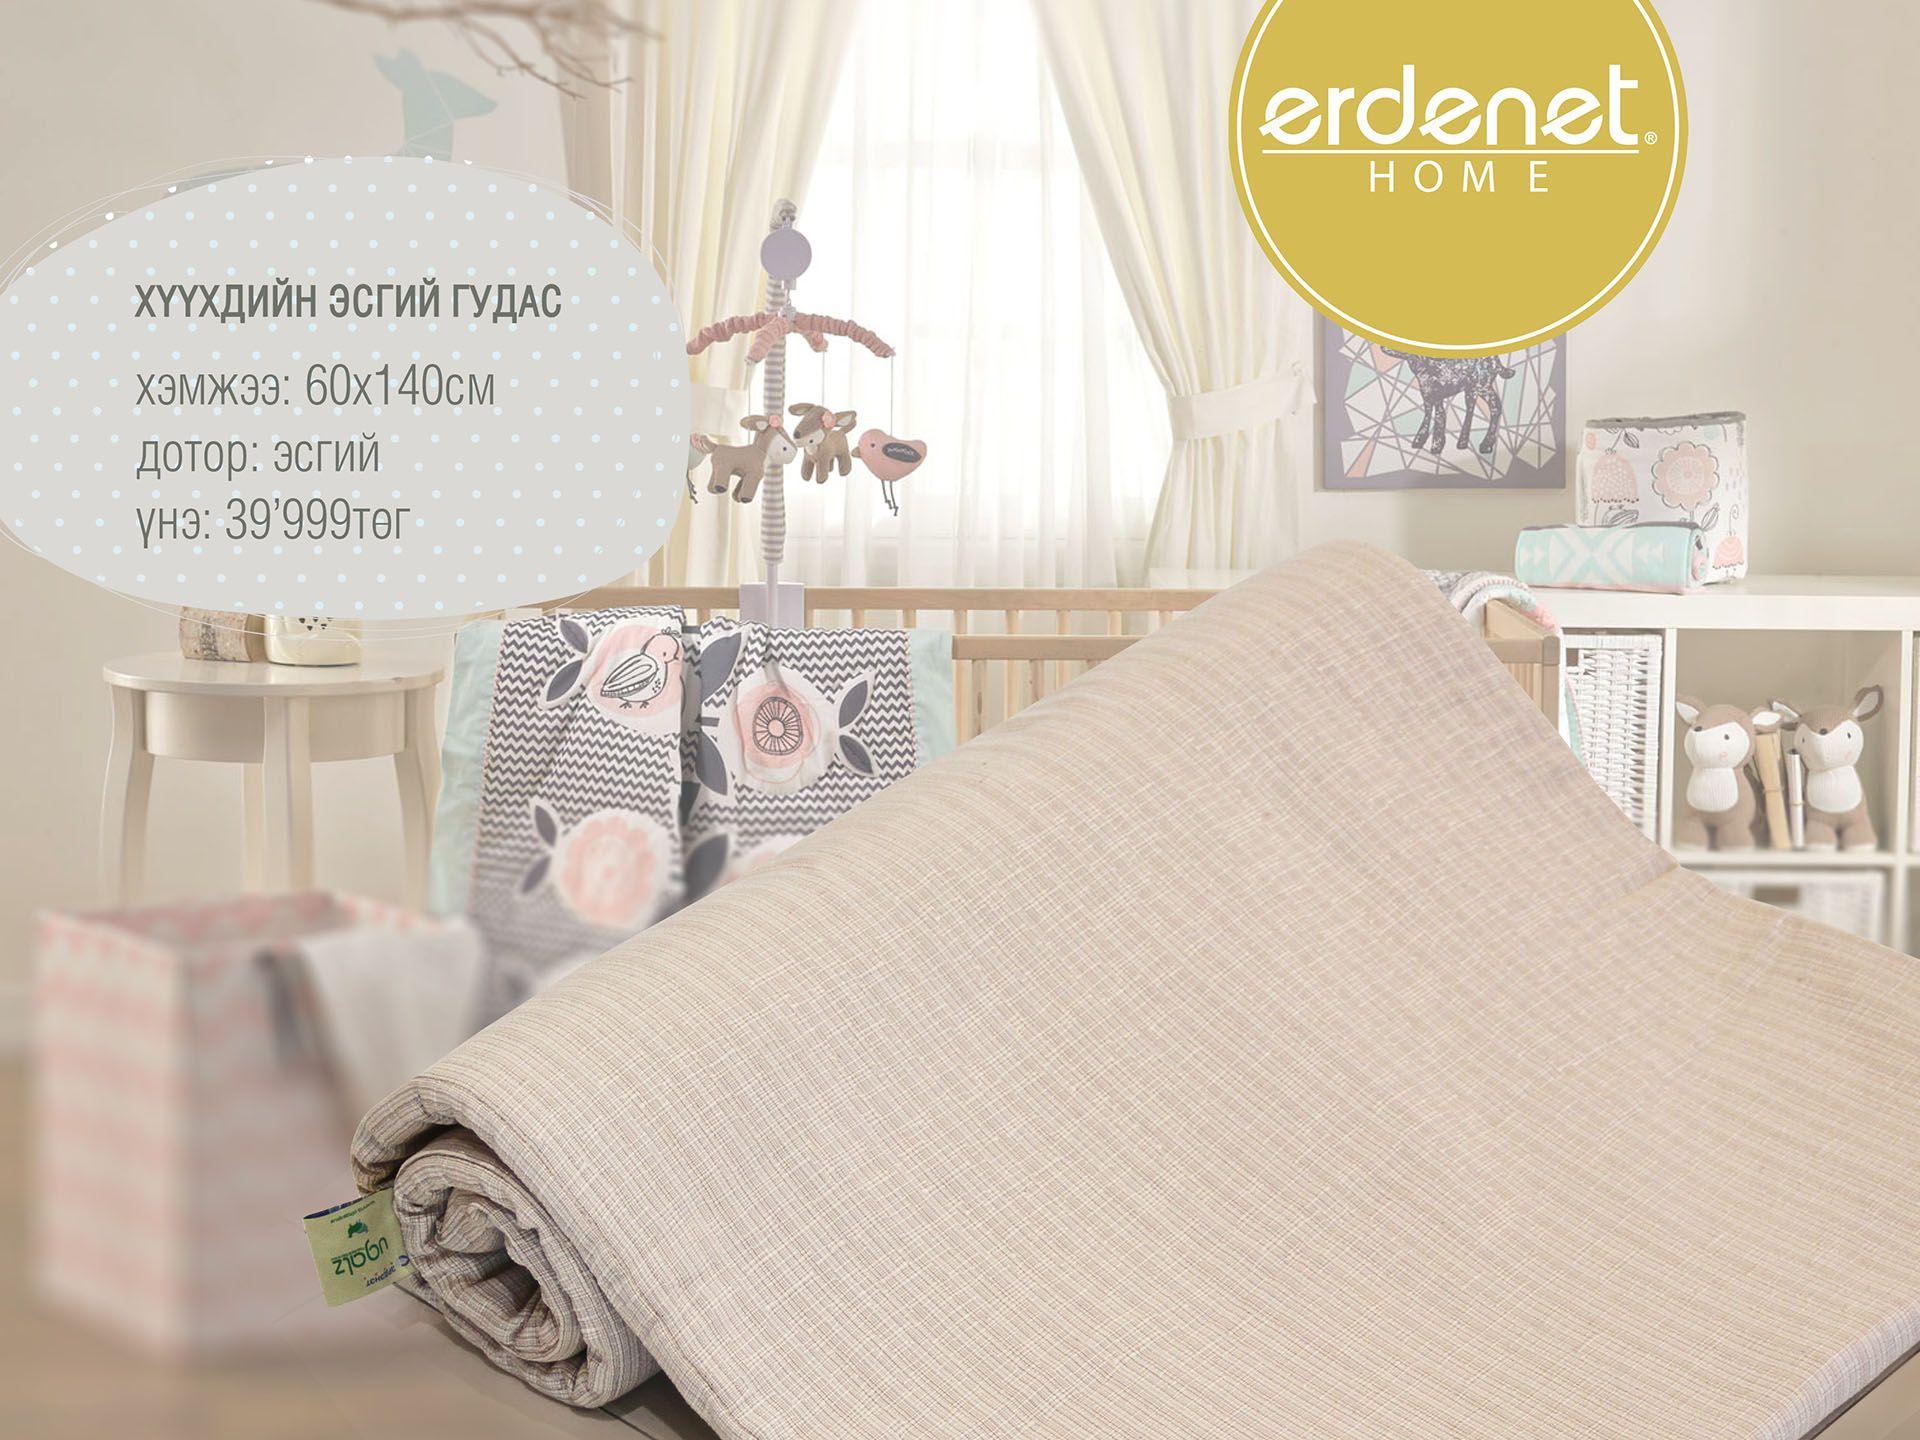 baby mattress mat d o o n d d d d d n d d n size 60x140cm baby sleeping